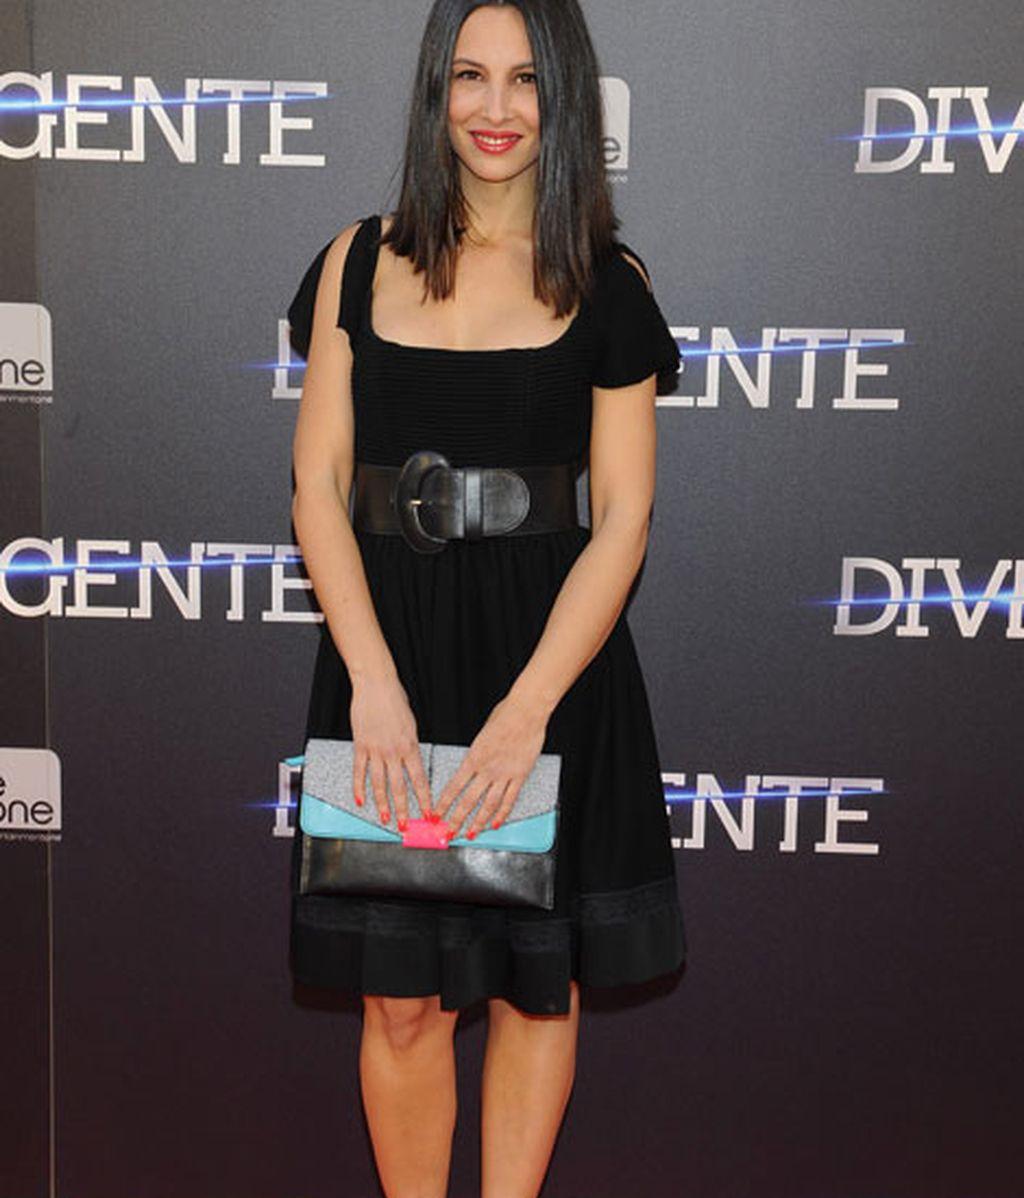 Xenia Tostado acudió con un mini vestido negro